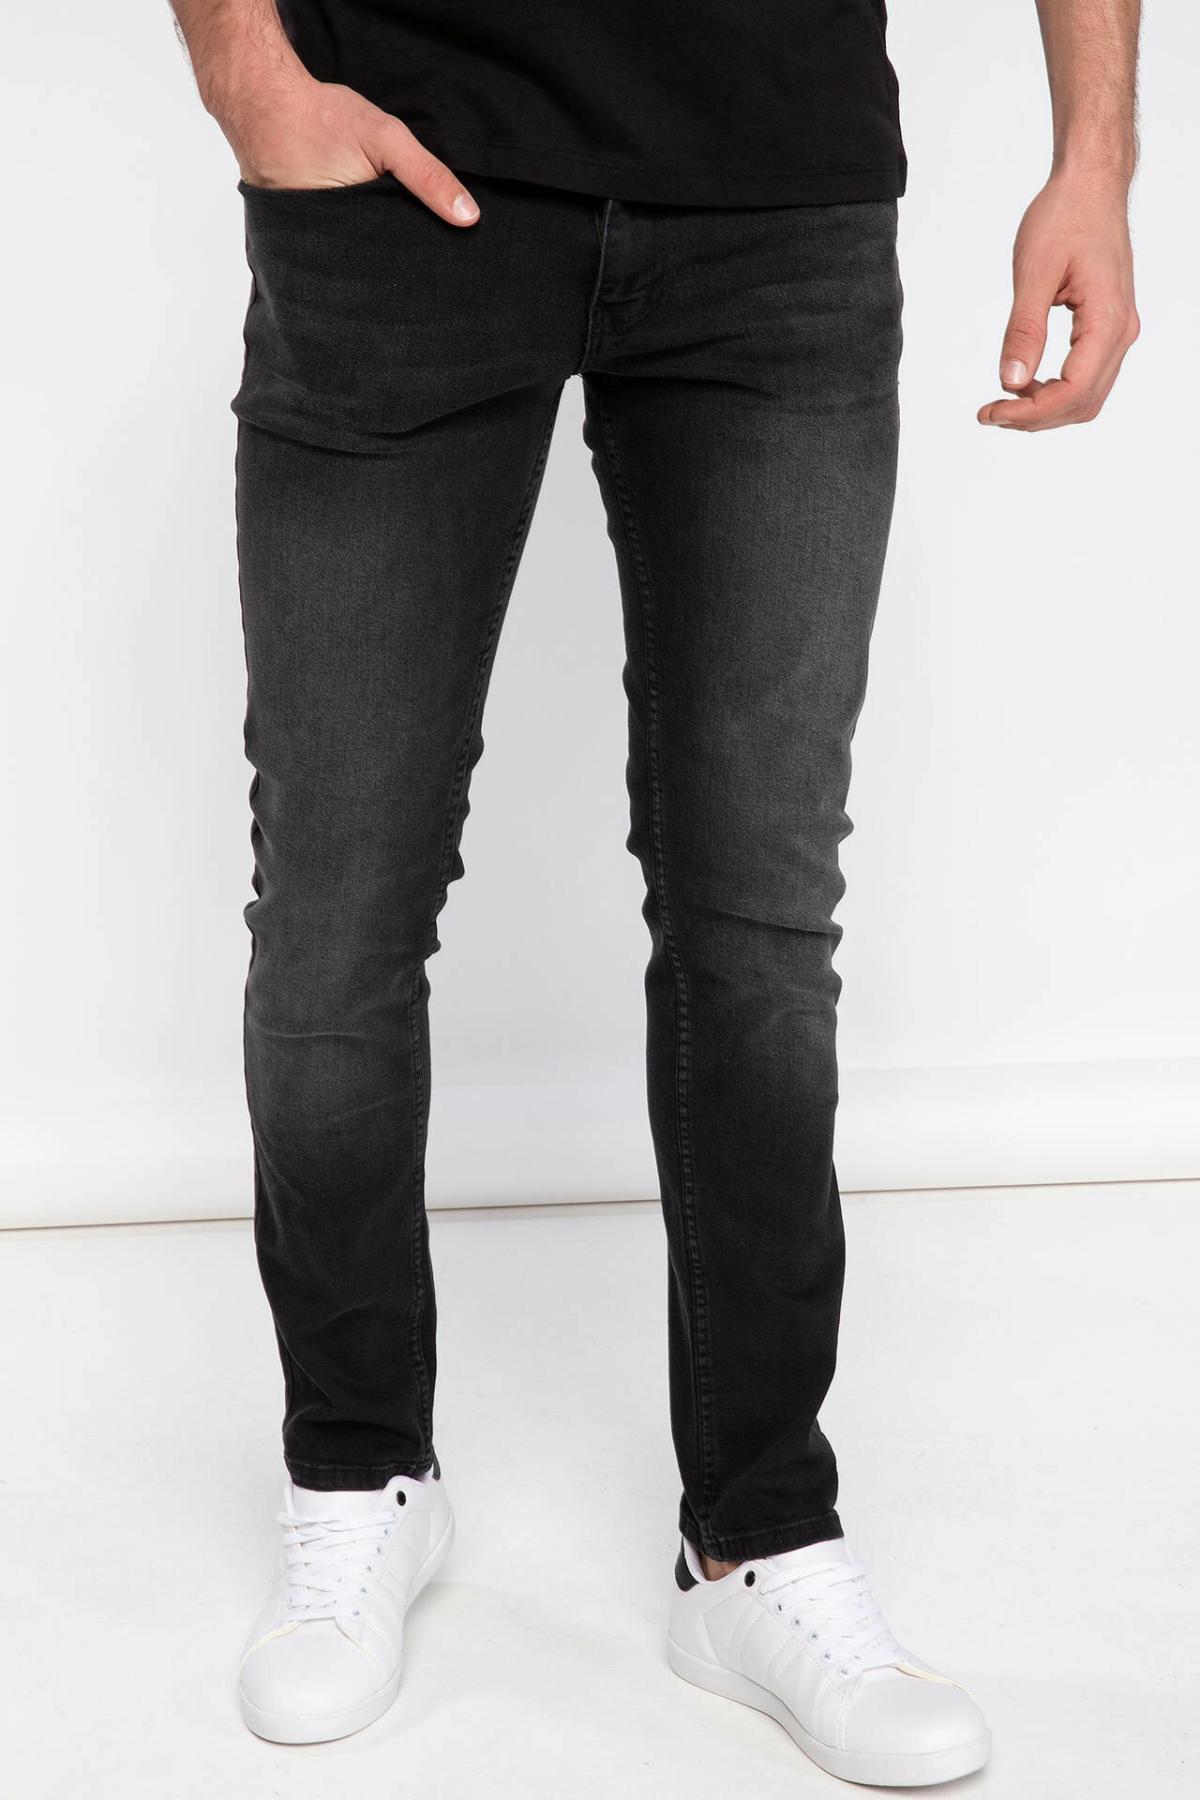 DeFacto Man Trousers-K4108AZ19SP